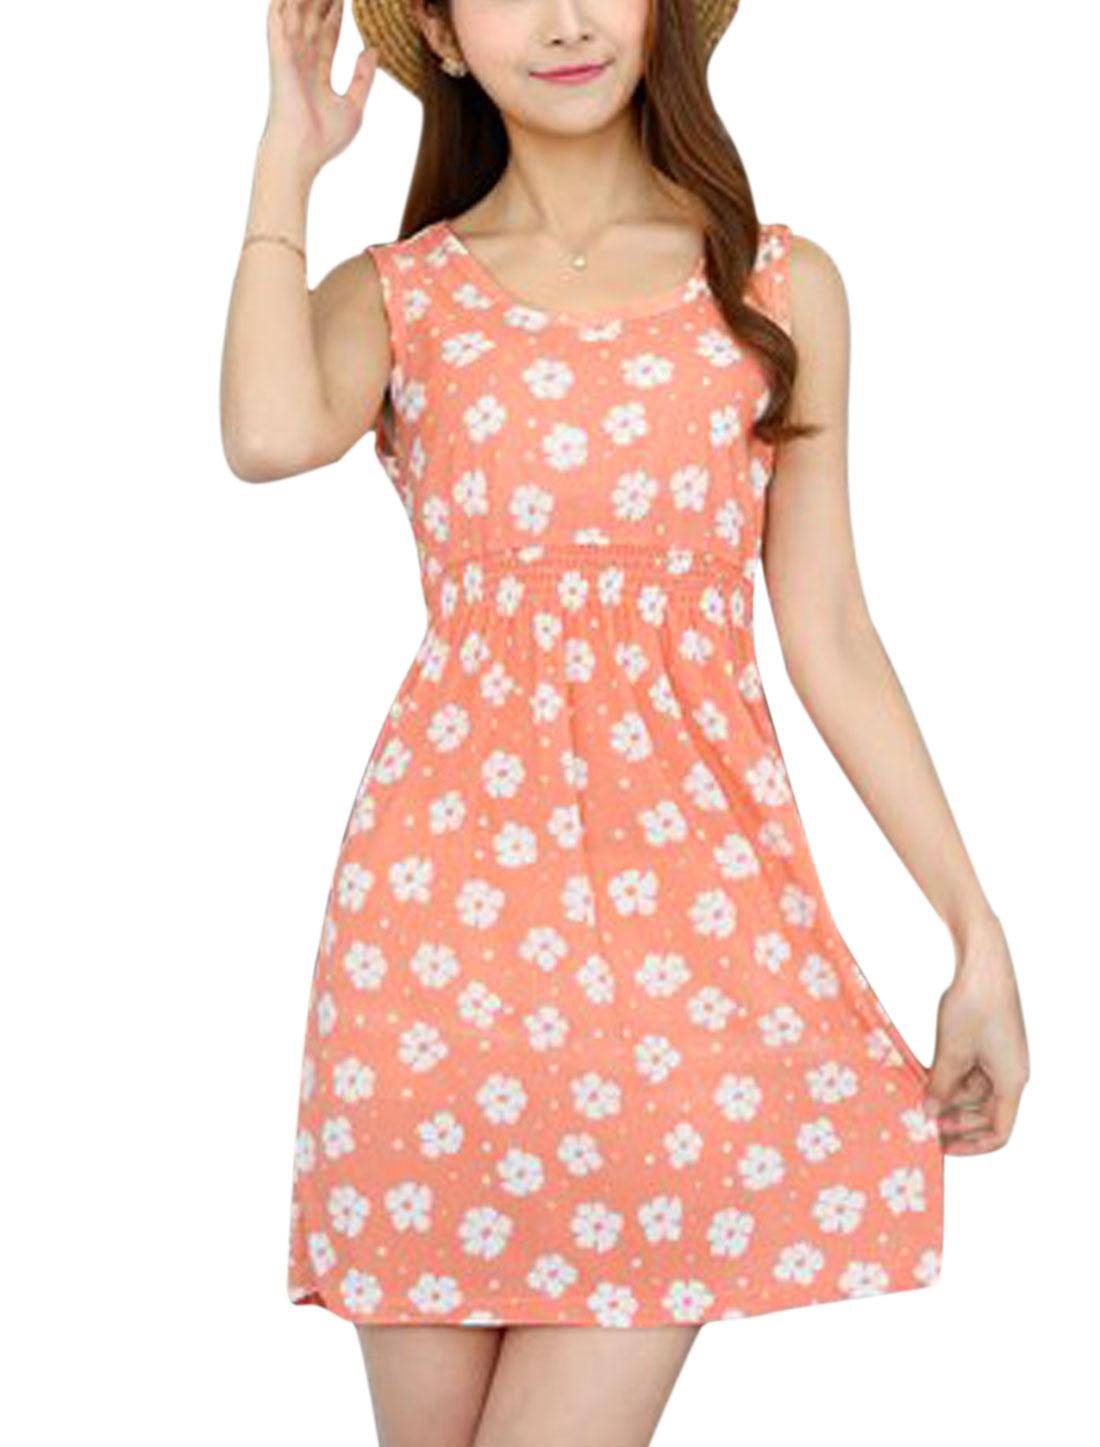 Ladies Round Neck Elastic Waist Floral Print Summer Dresses Pale Pink XS